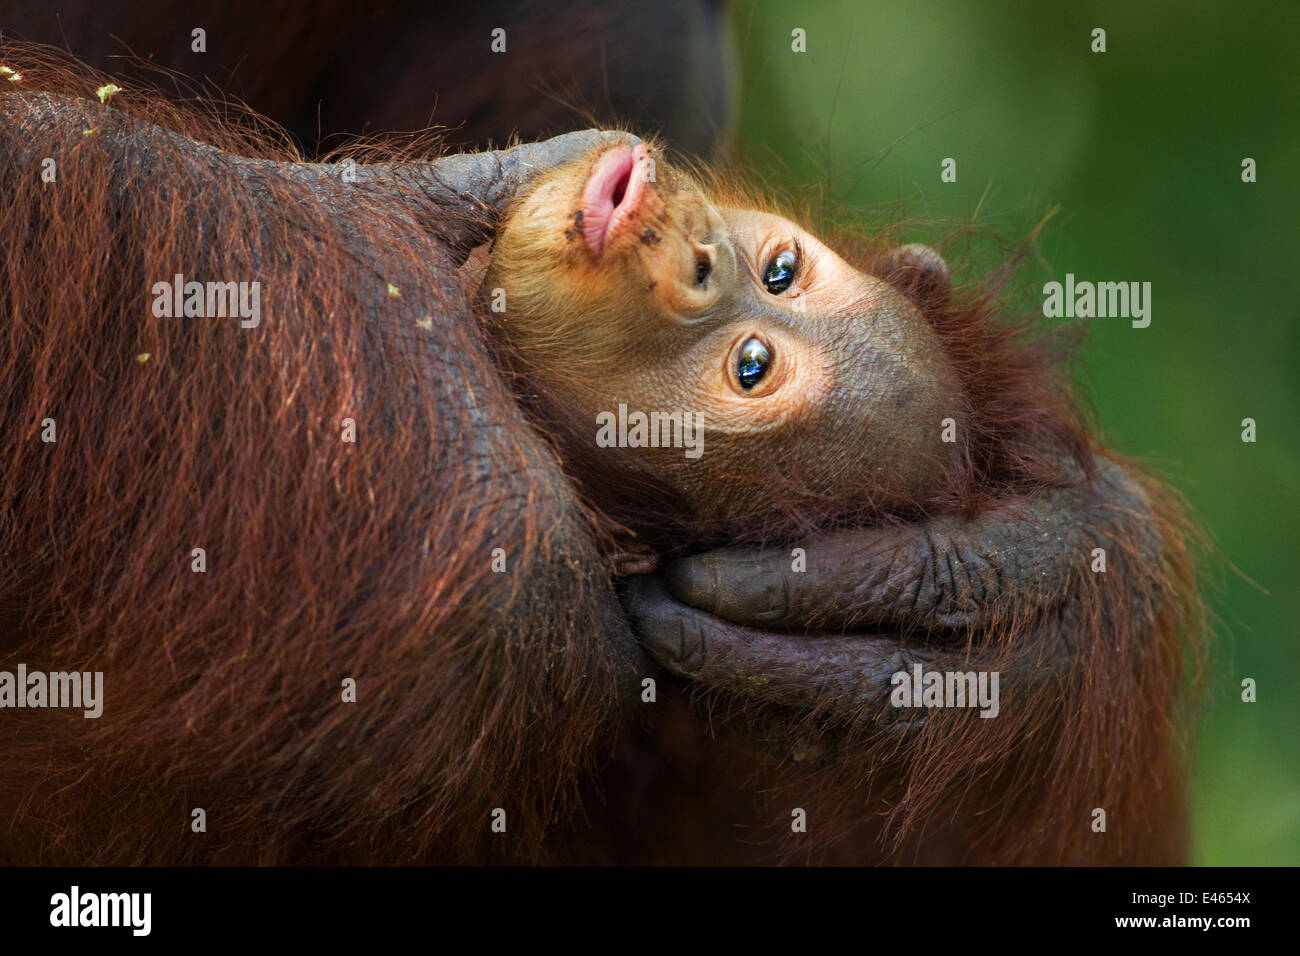 Bornean Orangutan (Pongo pygmaeus wurmbii) age 3-6 months being groomed by it's mother 'Gina'. Camp - Stock Image